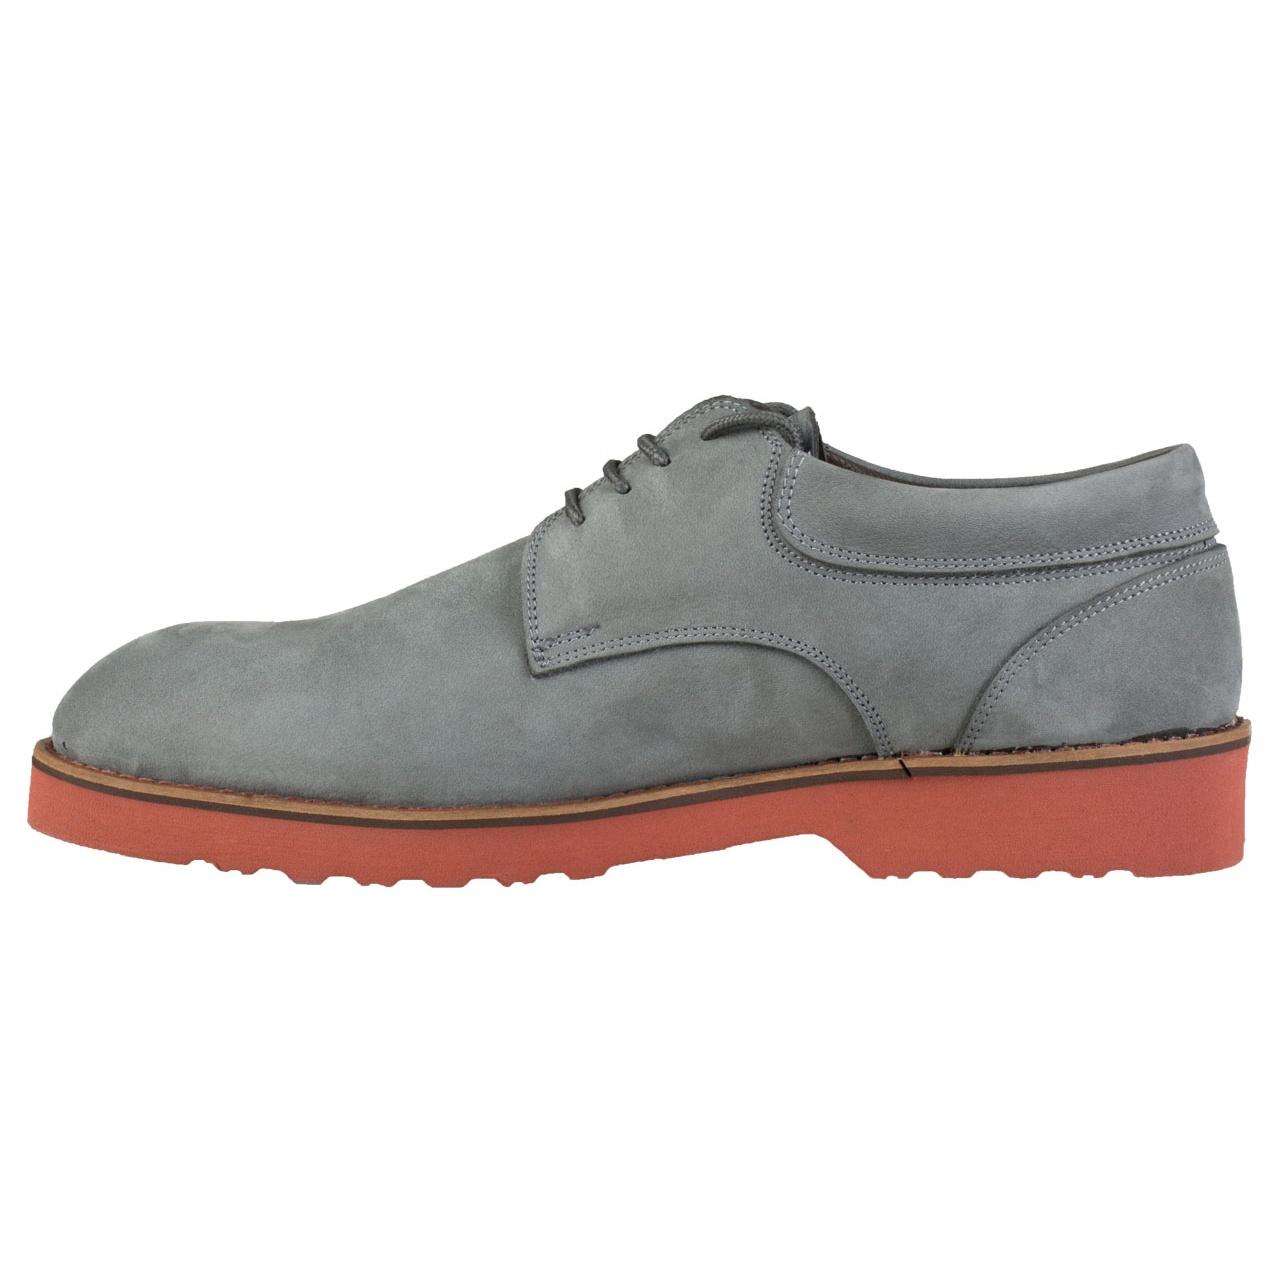 کفش چرم مردانه رسا چرم کد 102             , خرید اینترنتی